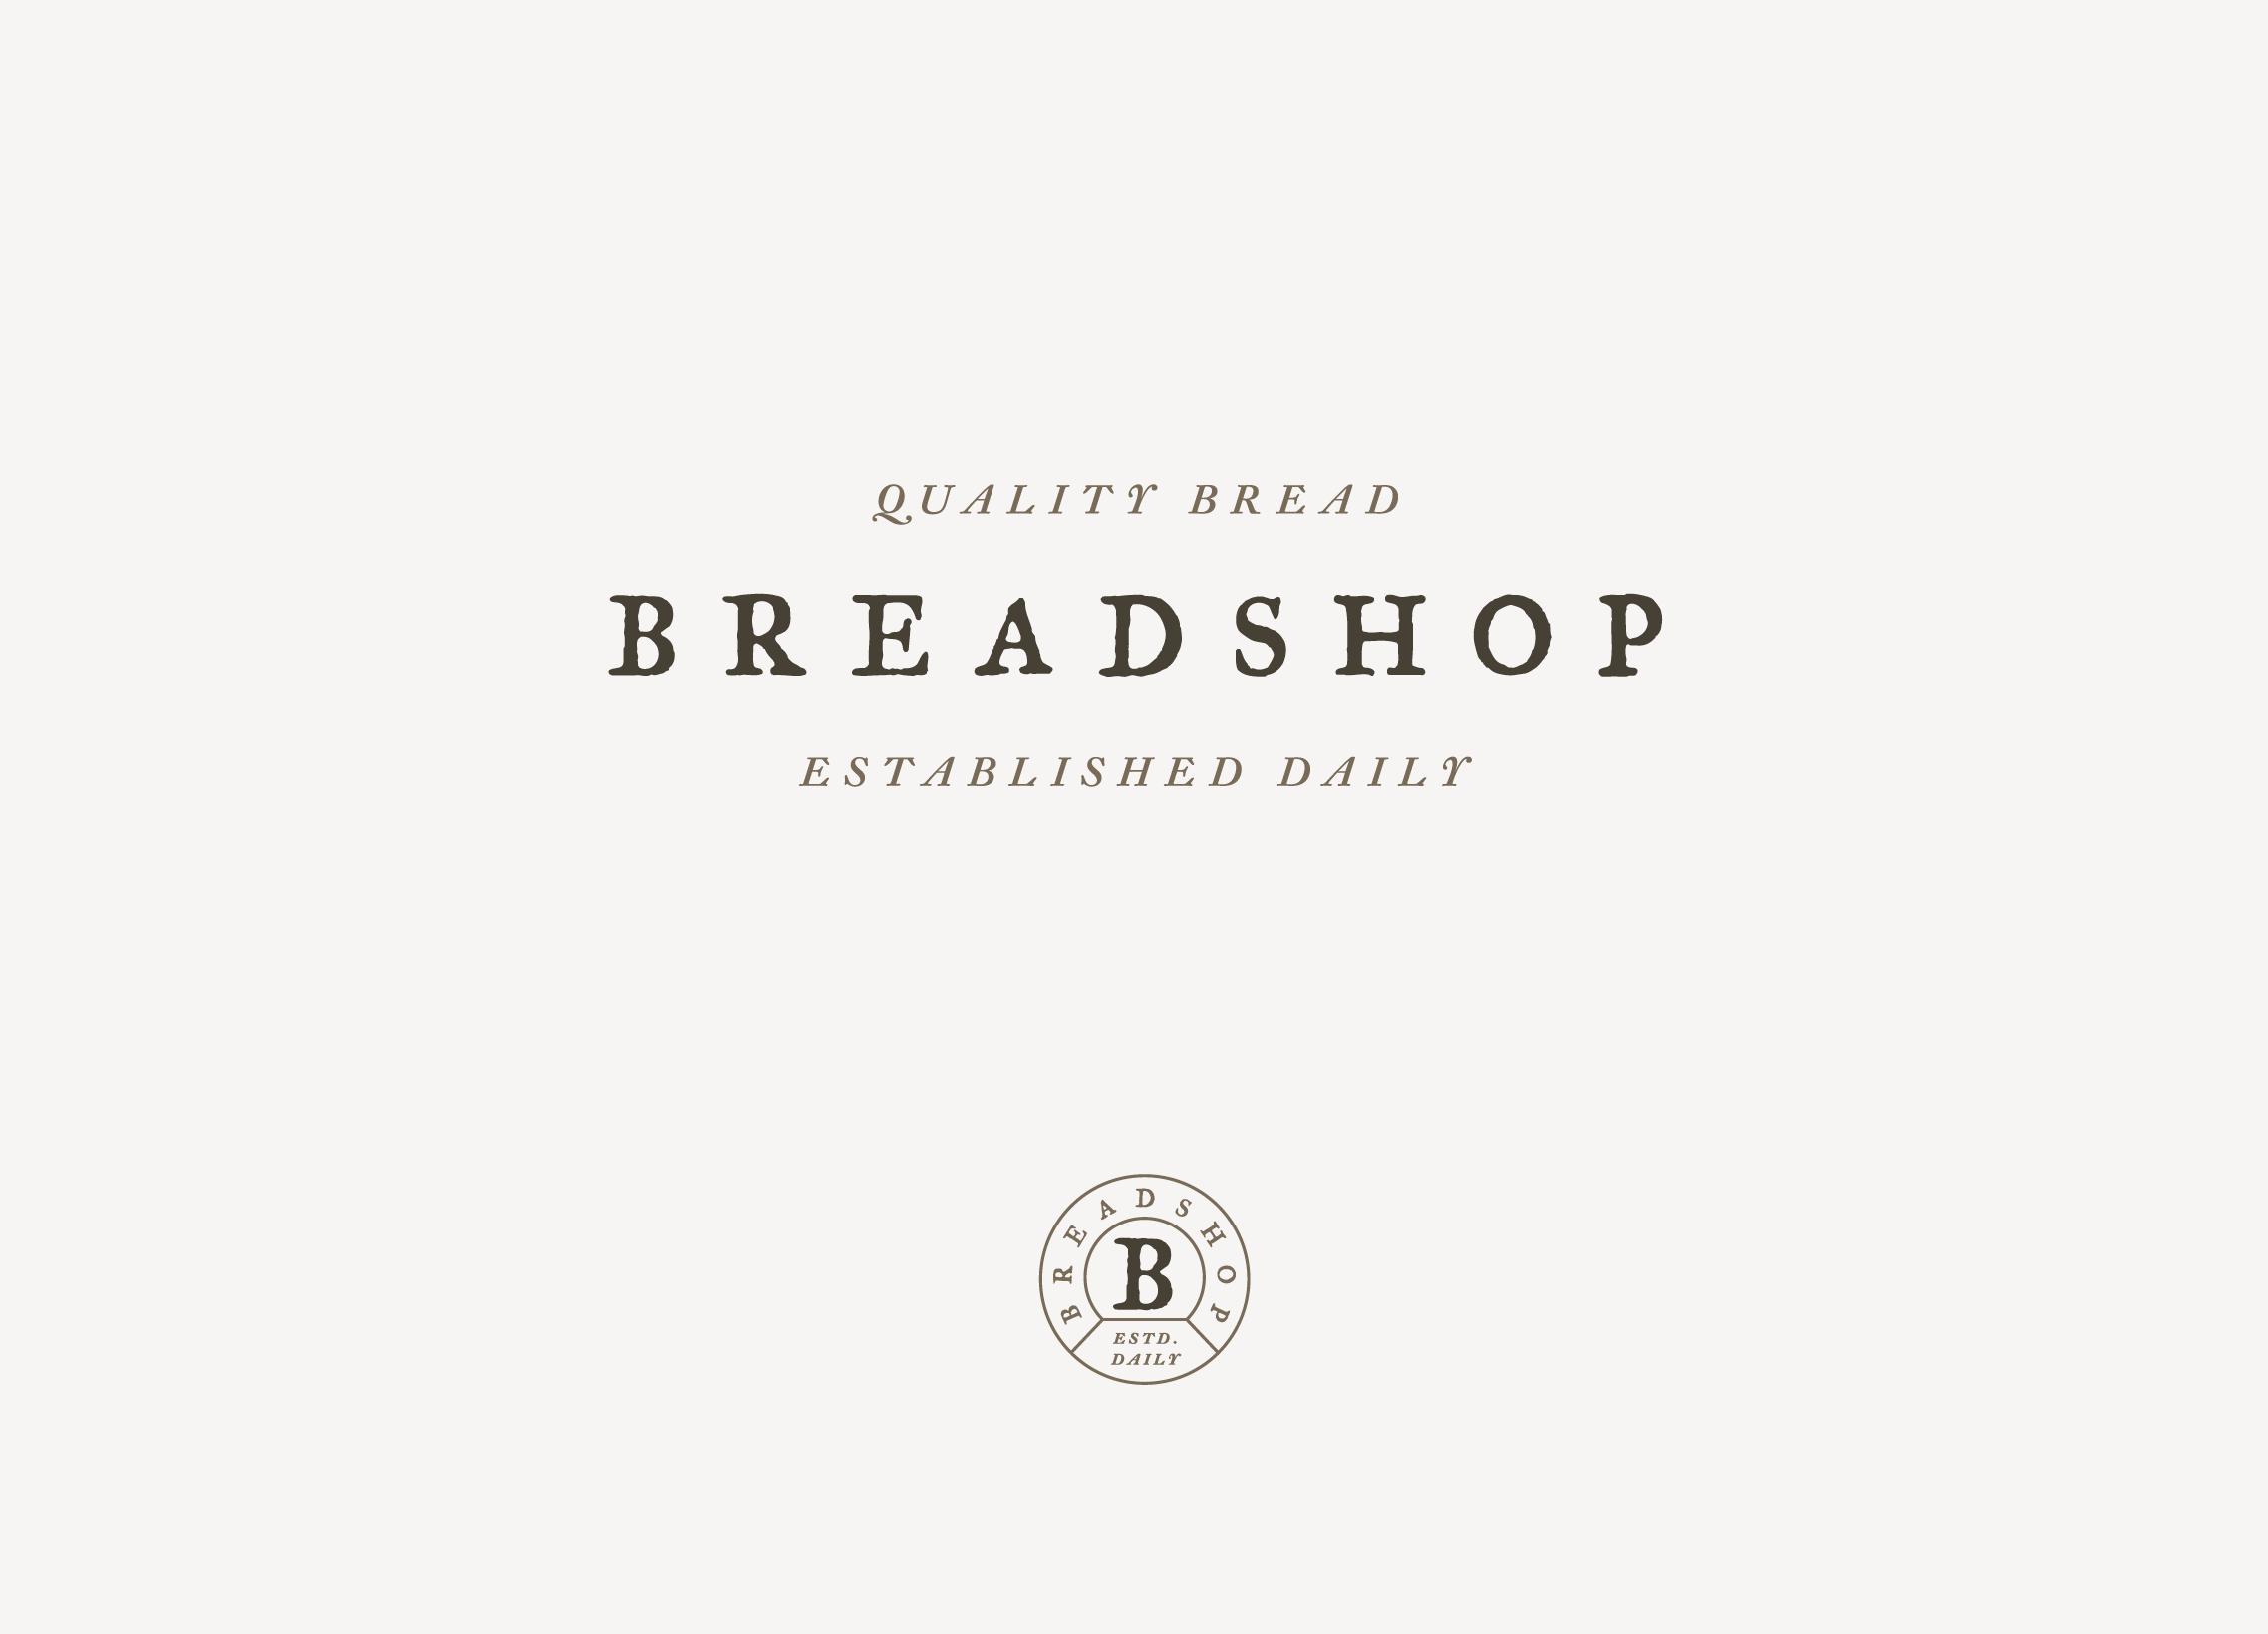 breadshop-2.jpg